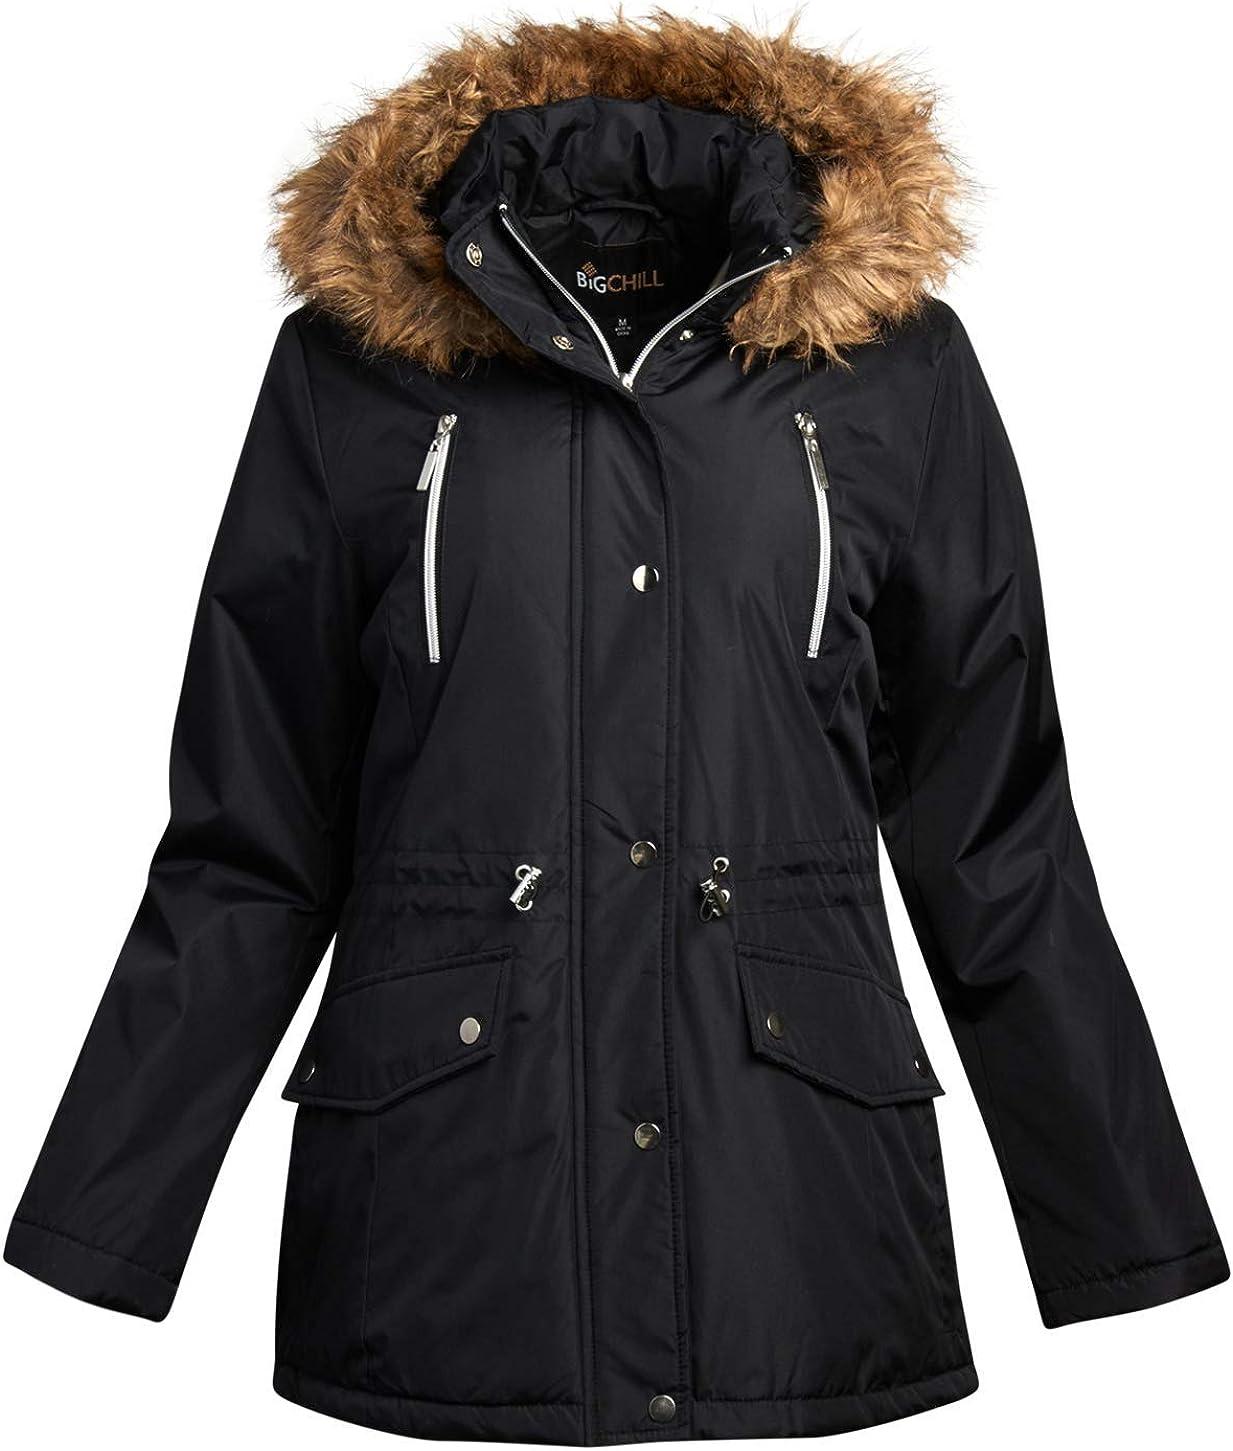 Big Chill Women's Winter Coat – Heavyweight Parka Anorak Long Length Jacket with Faux-Fur Trim Hood